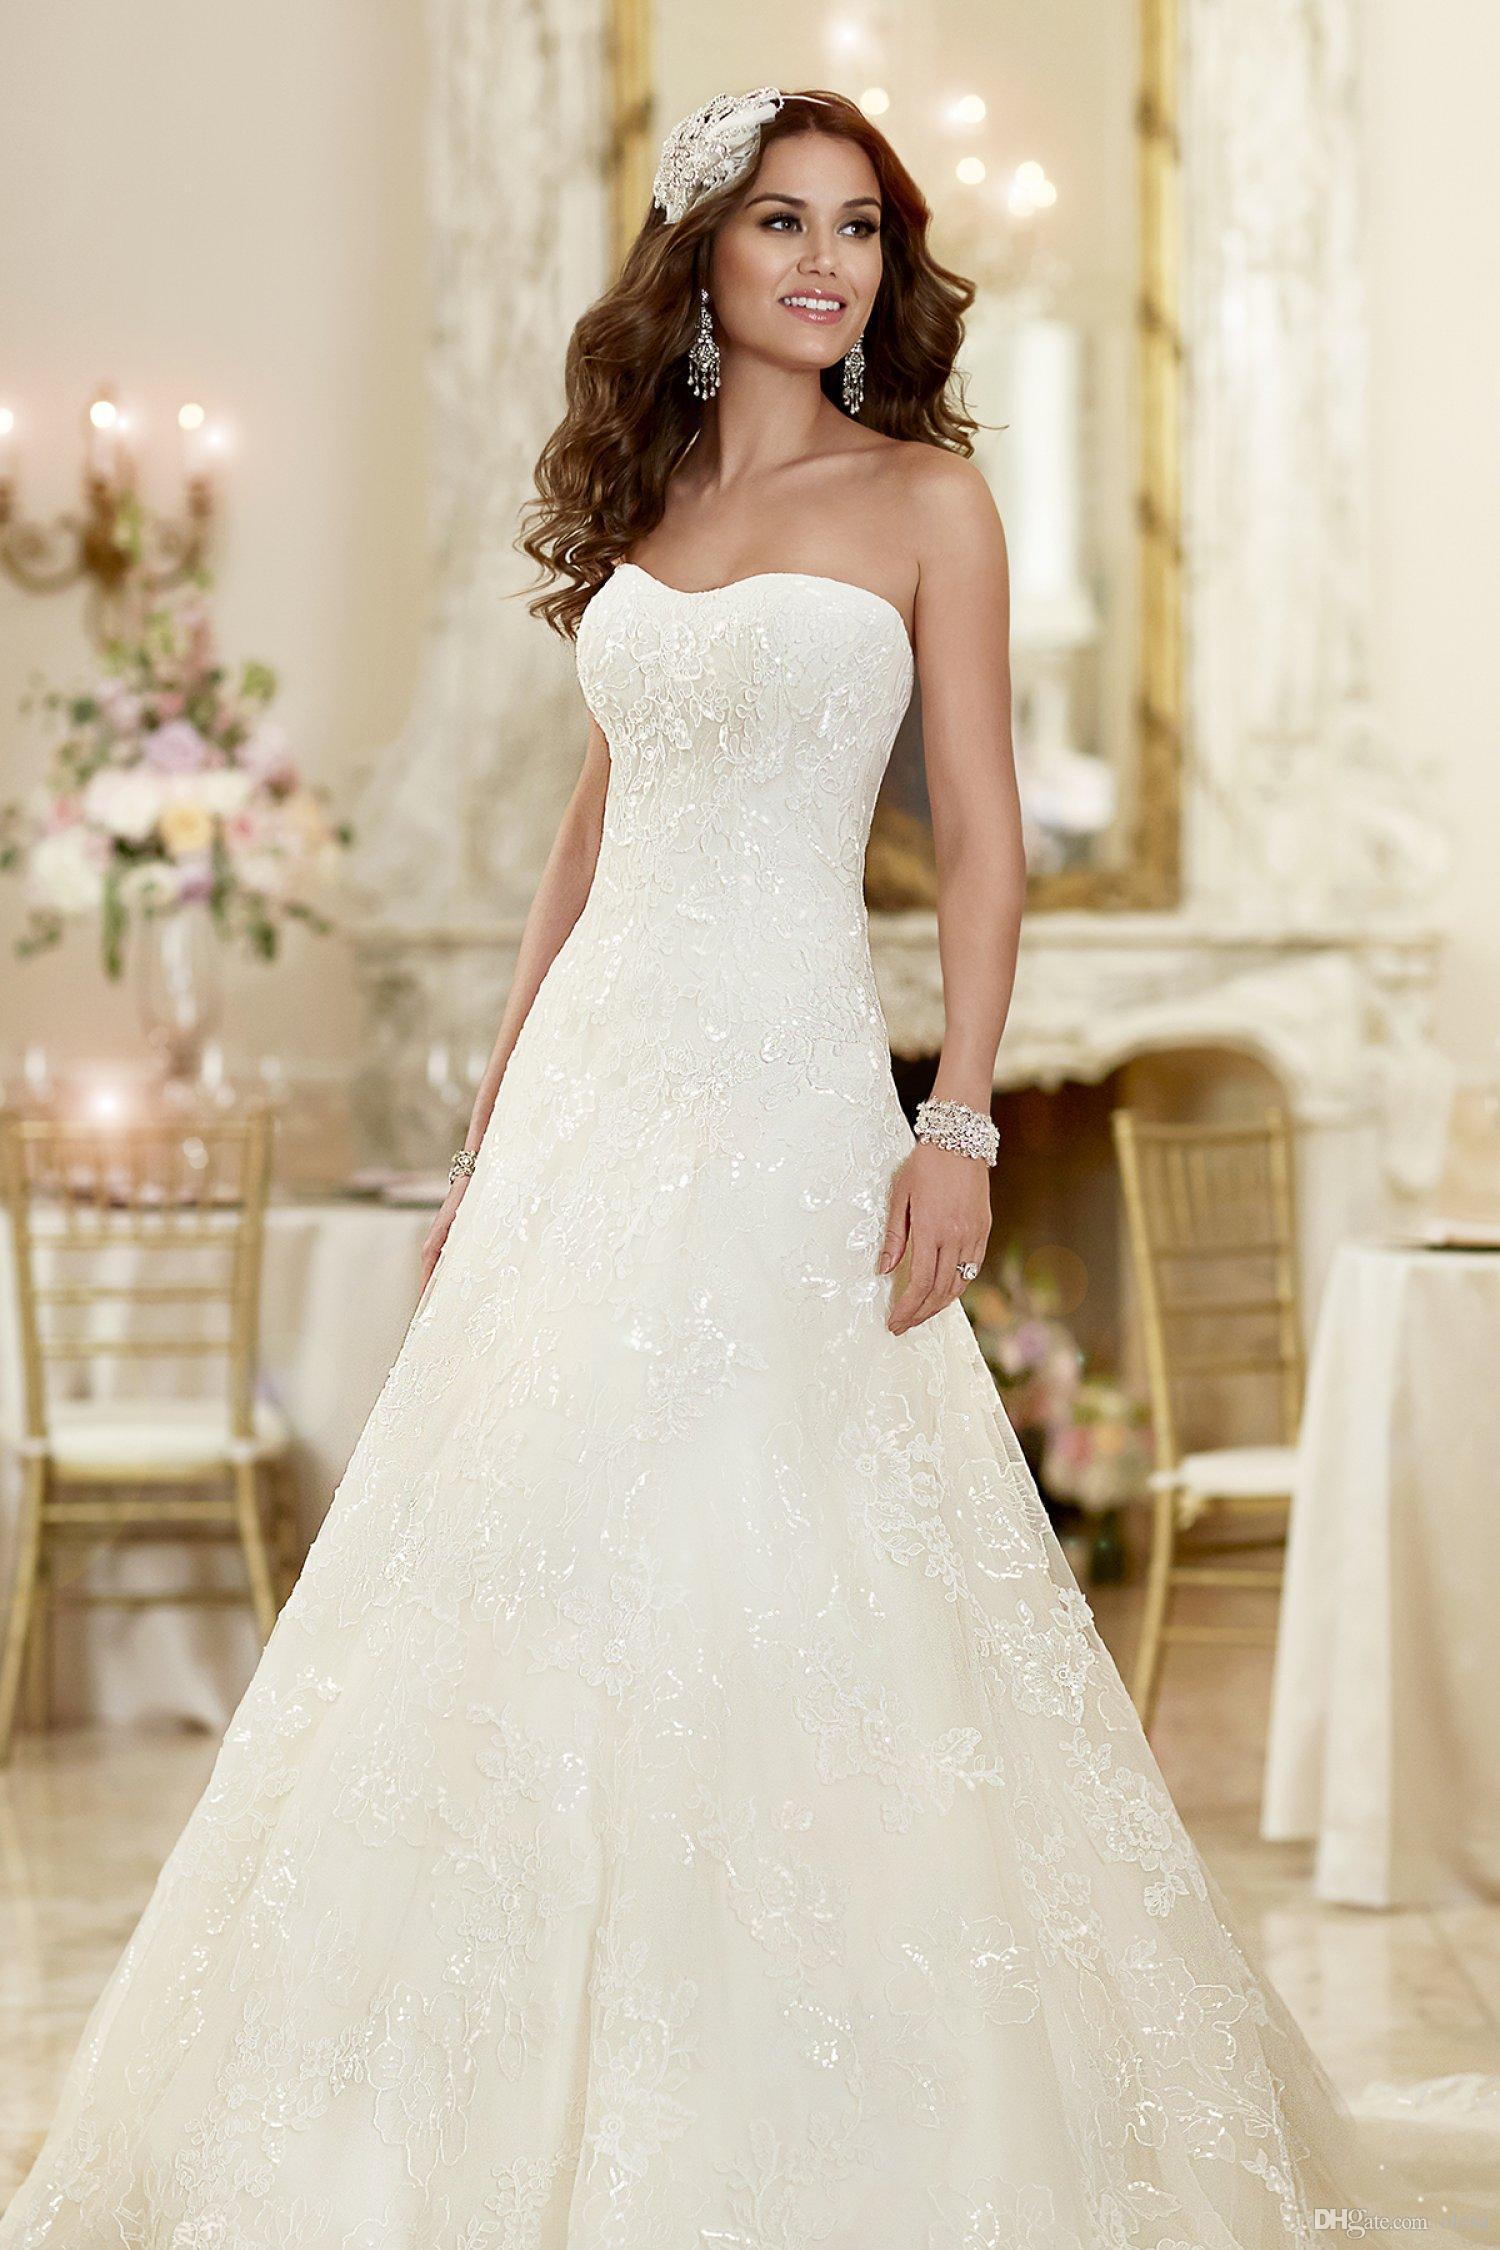 2015 Strapless Semi Sweetheart Neckline Bridal Gowns Elegant A Line ...